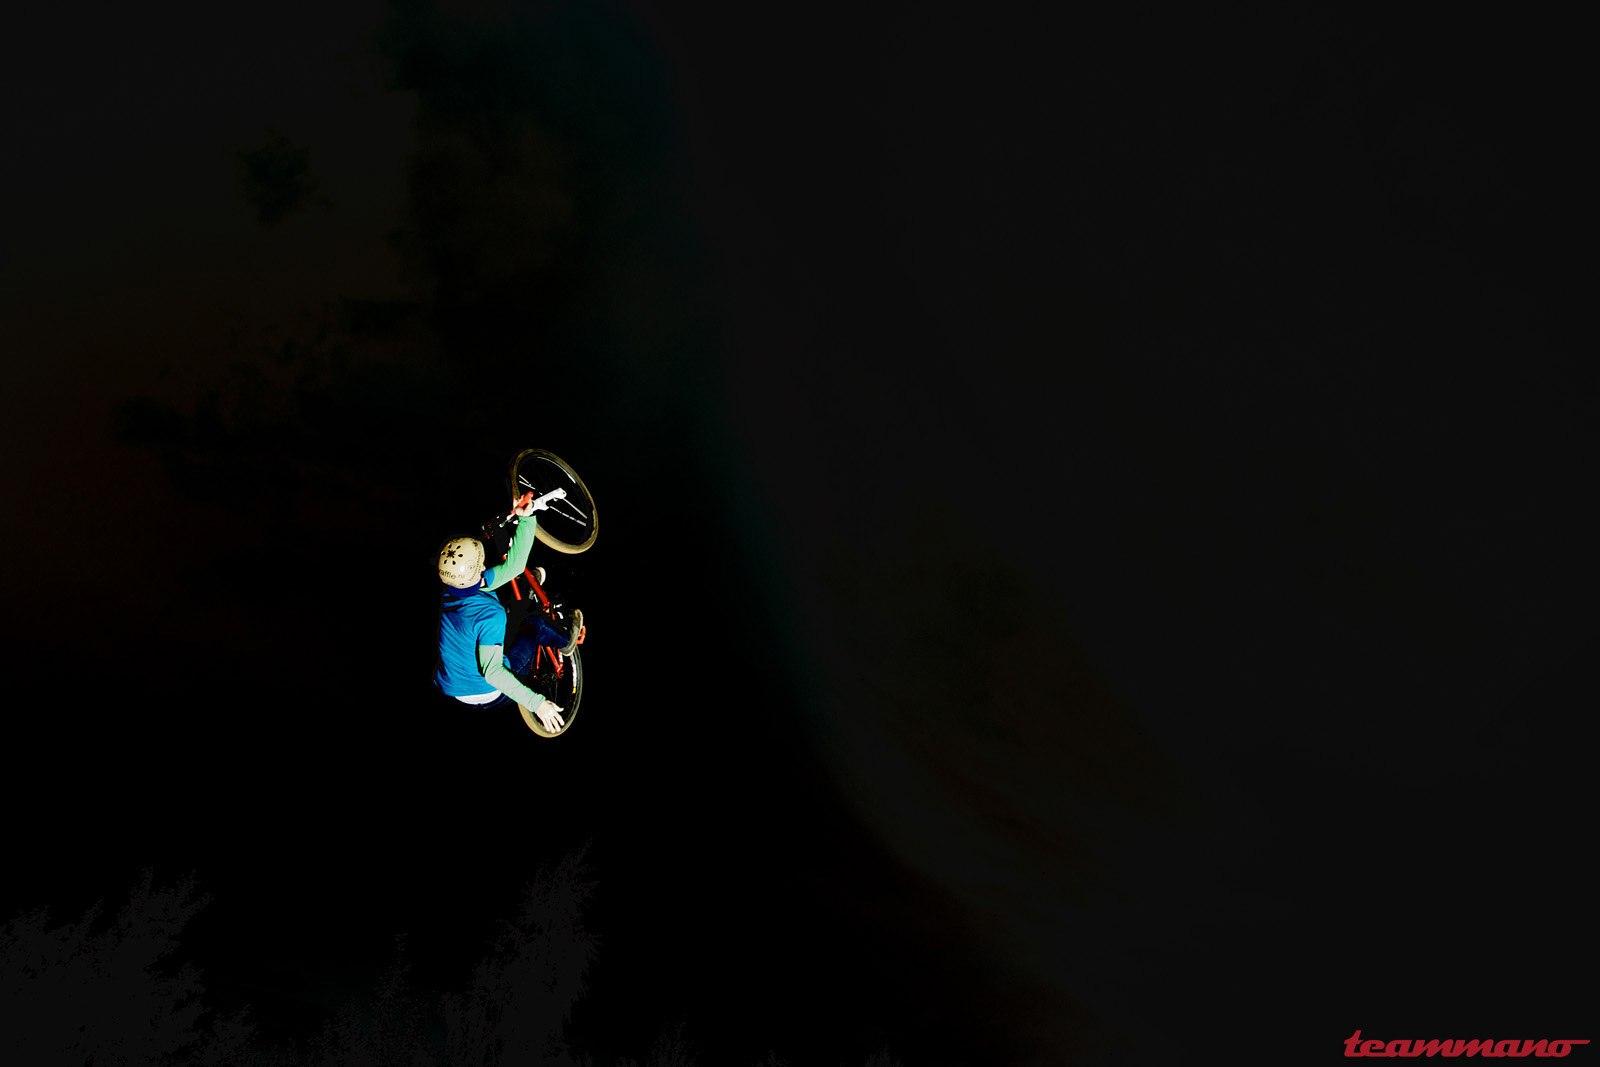 Блог компании TEAMMANO: Обзор вилки X-Fusion Vengeance от Василия Макарова